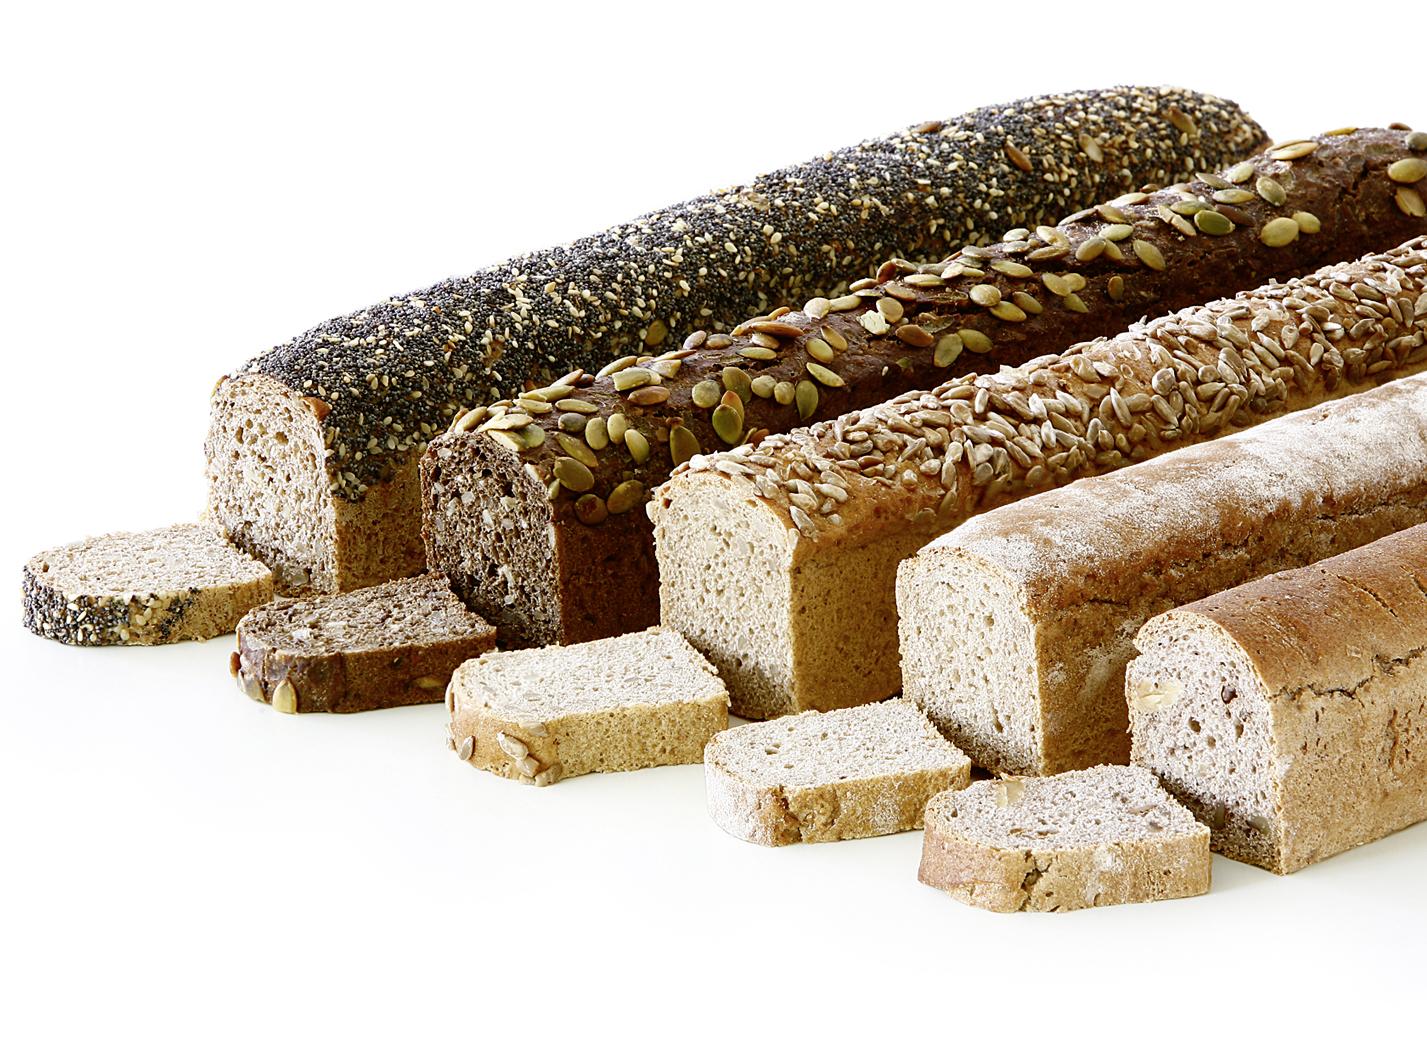 Buffet-Bread - Mix of bread bars with 3 pieces of each: rye, walnut, sunflower seeds, pumpkin seeds, spelt breads length: 39 cm